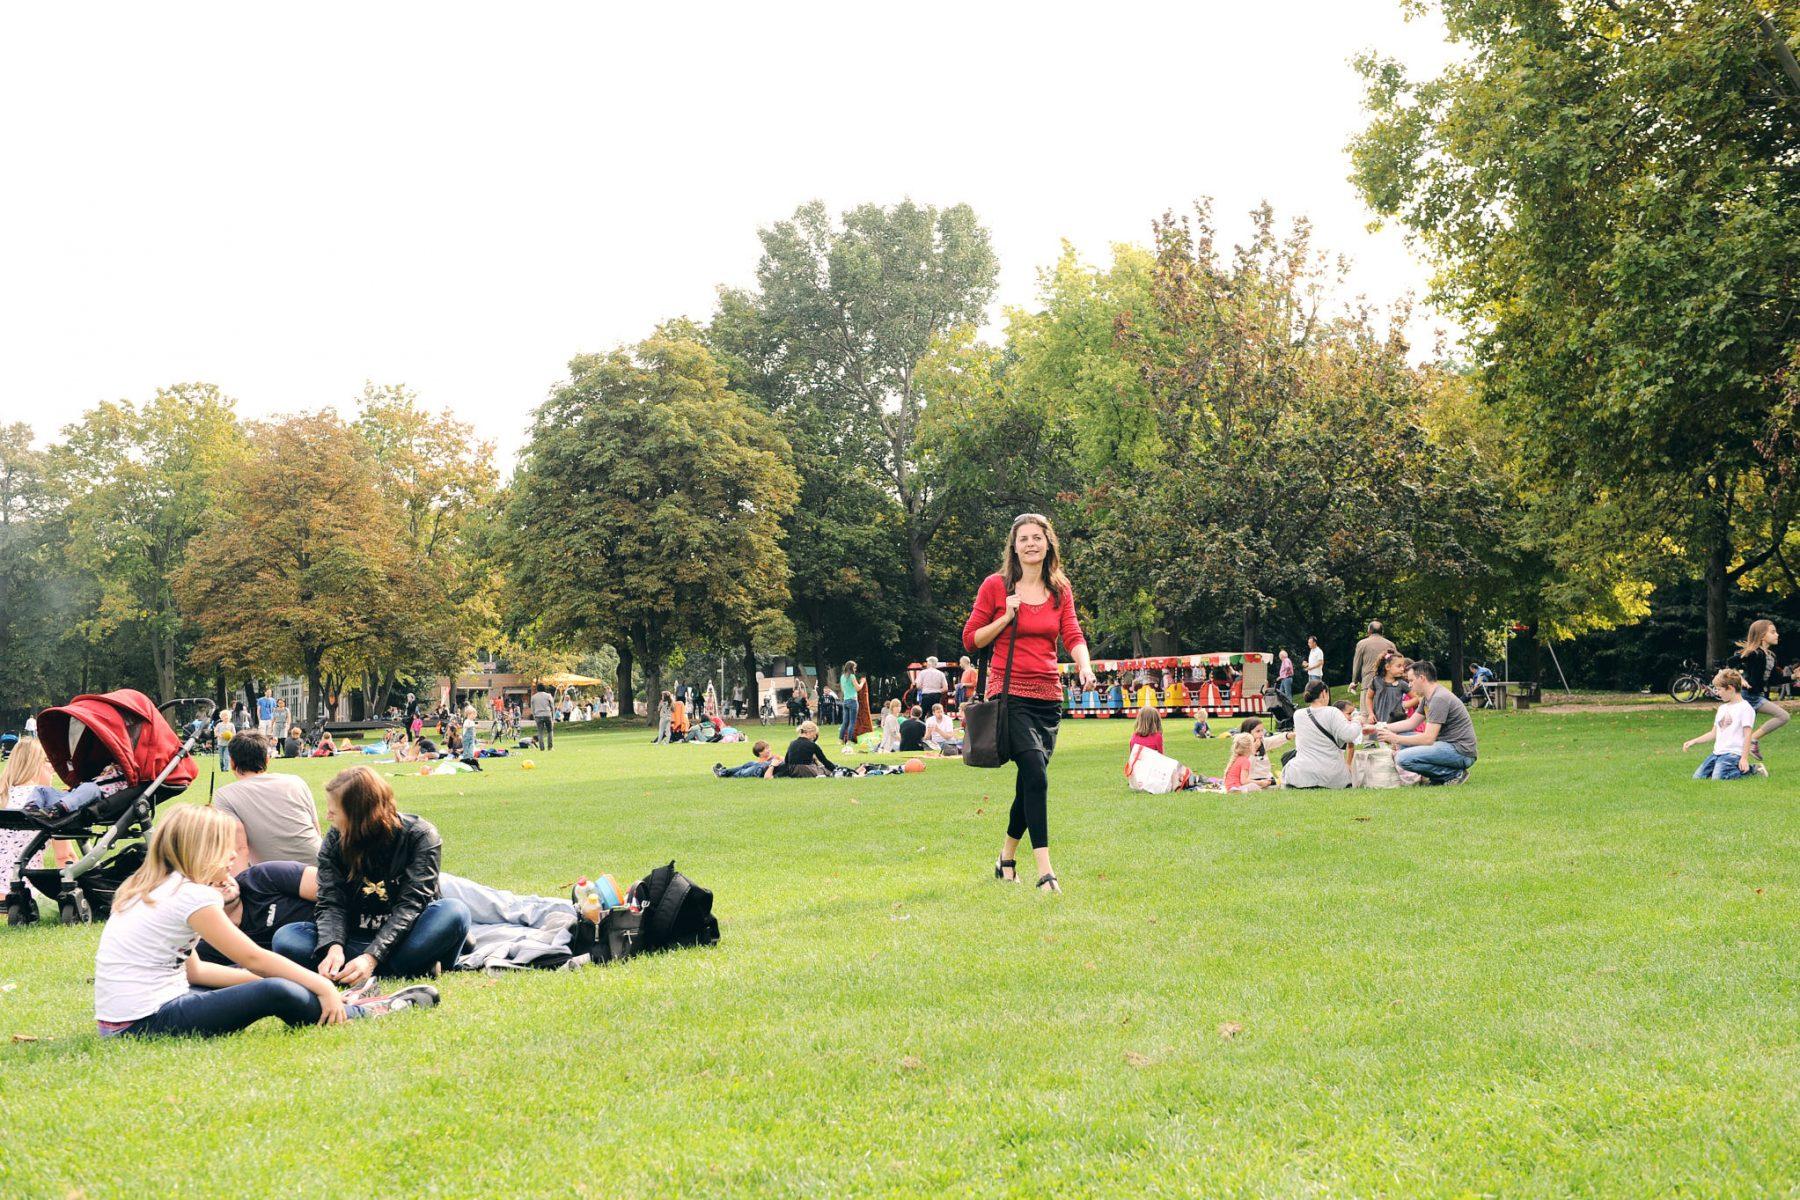 Volkspark Mainz